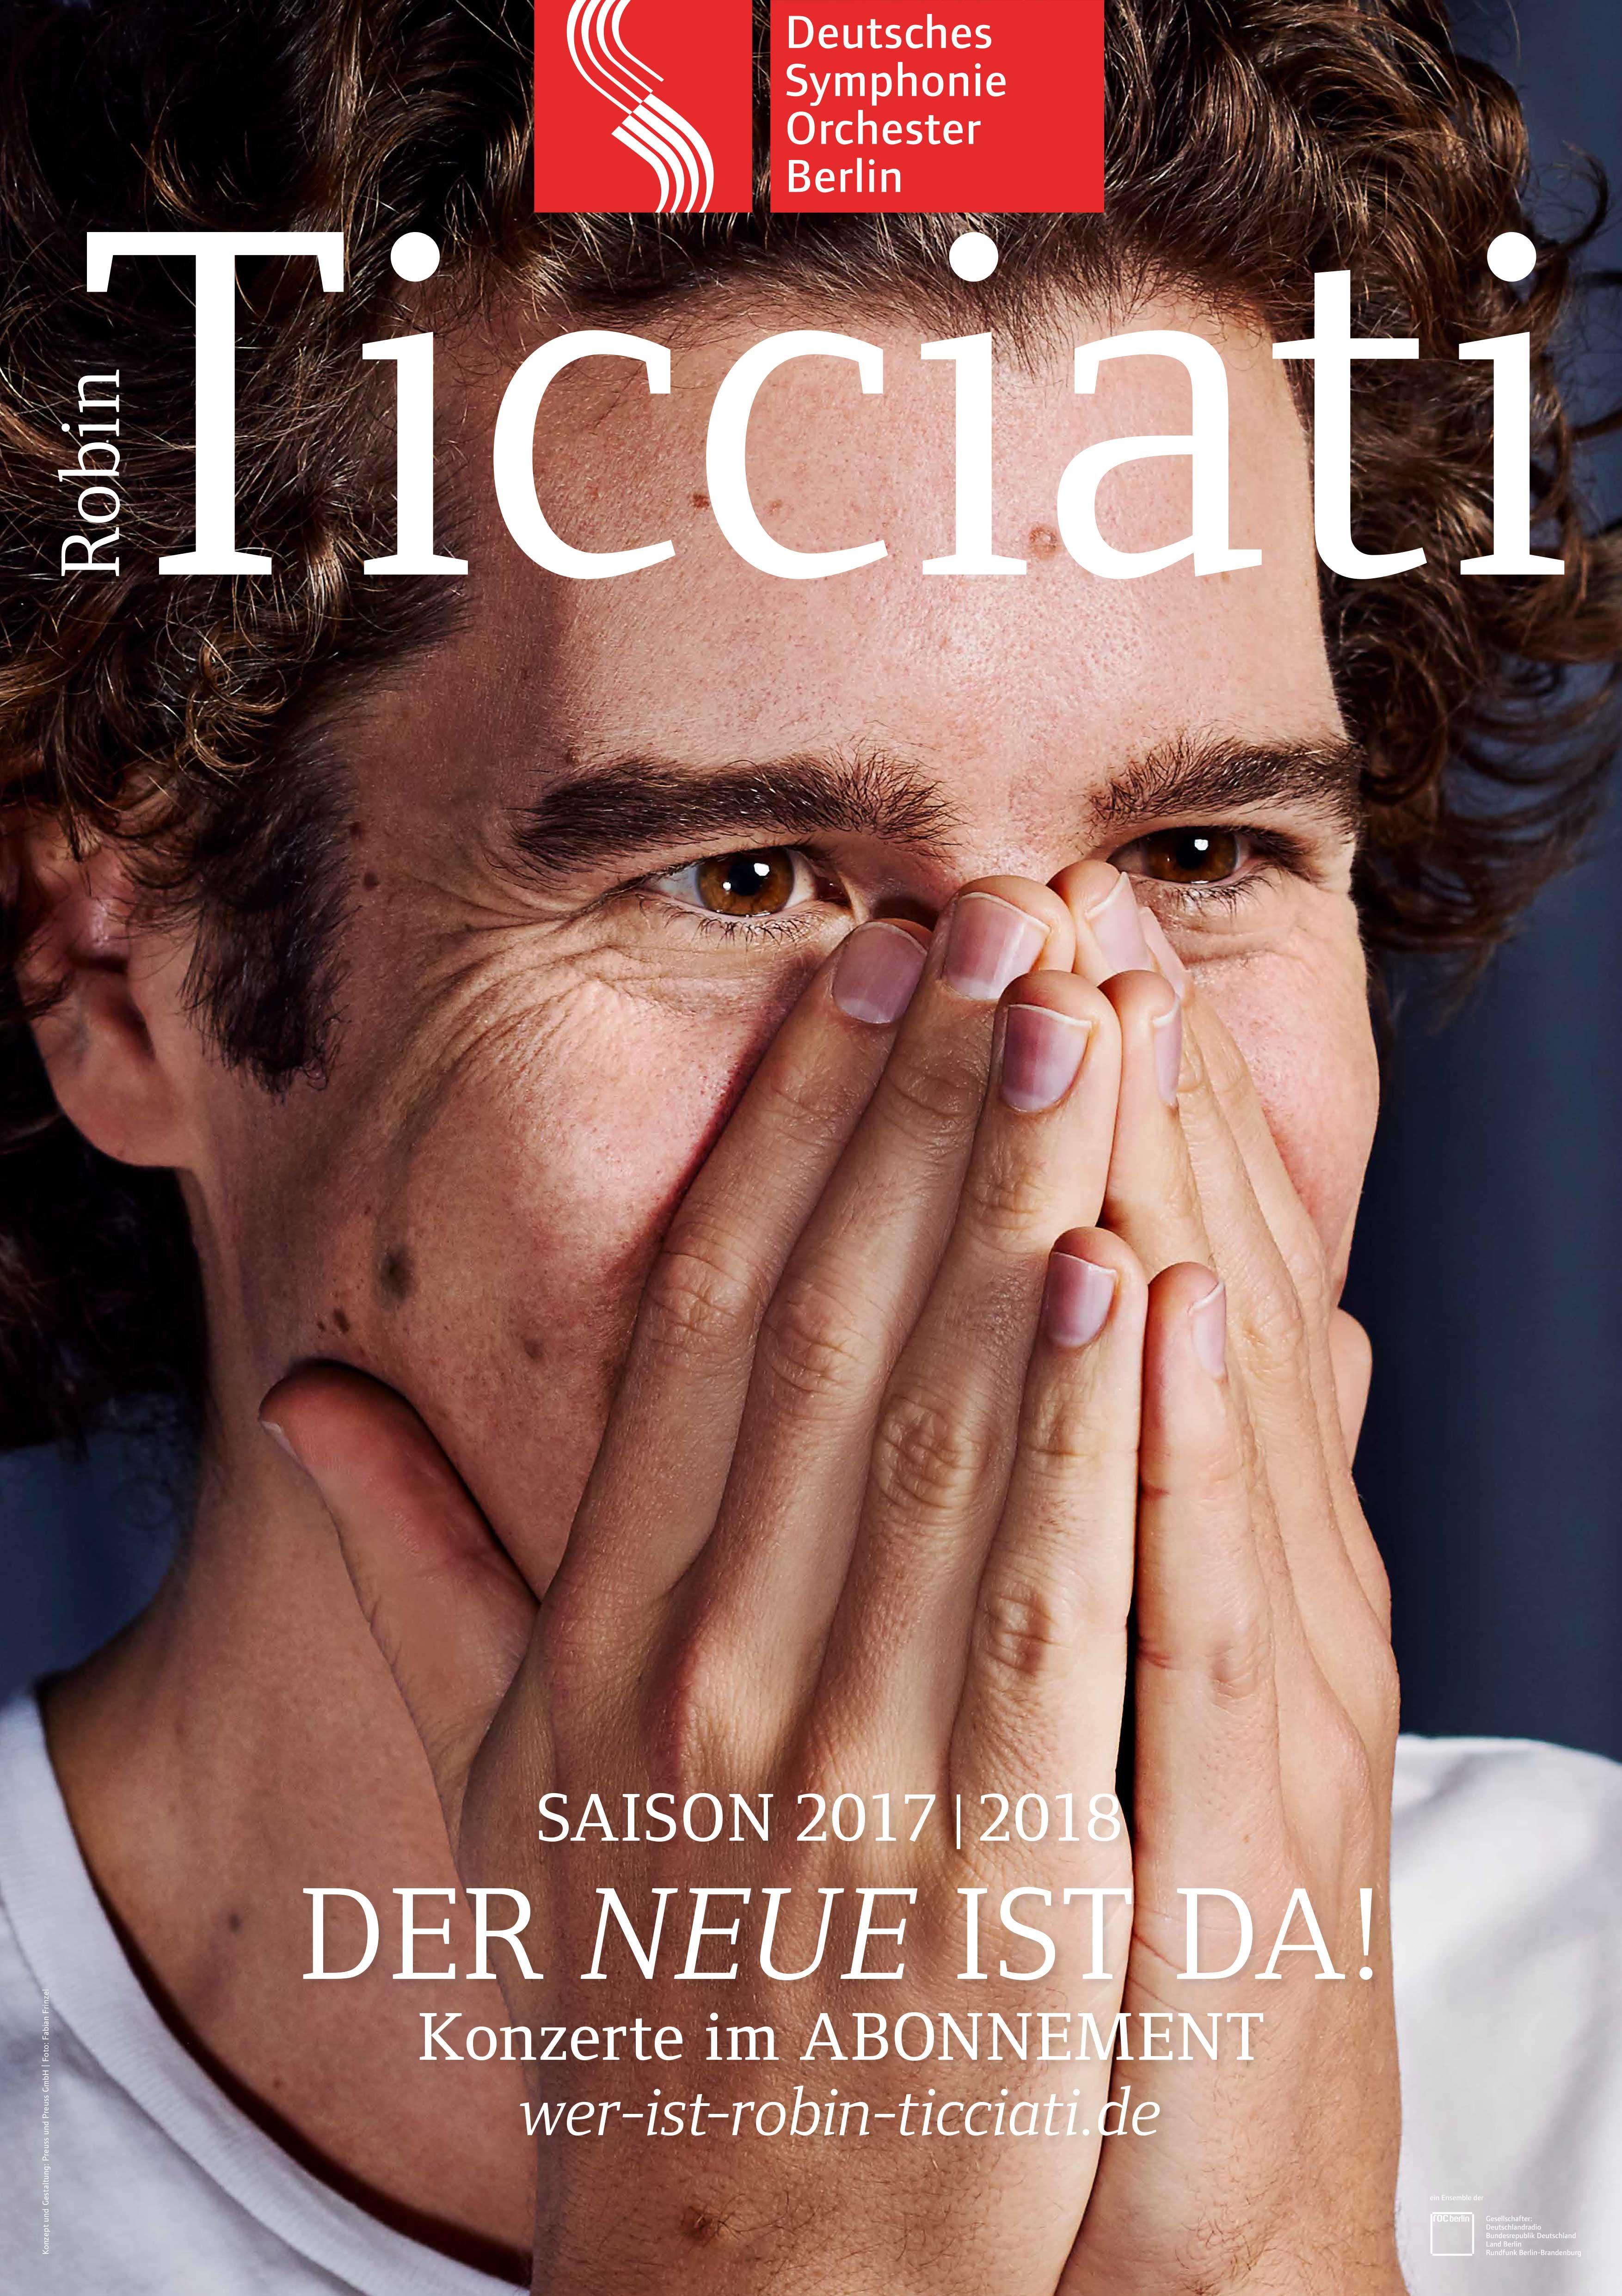 Plakat Chefdirigent Robin Ticciati - Der Neue ist da!